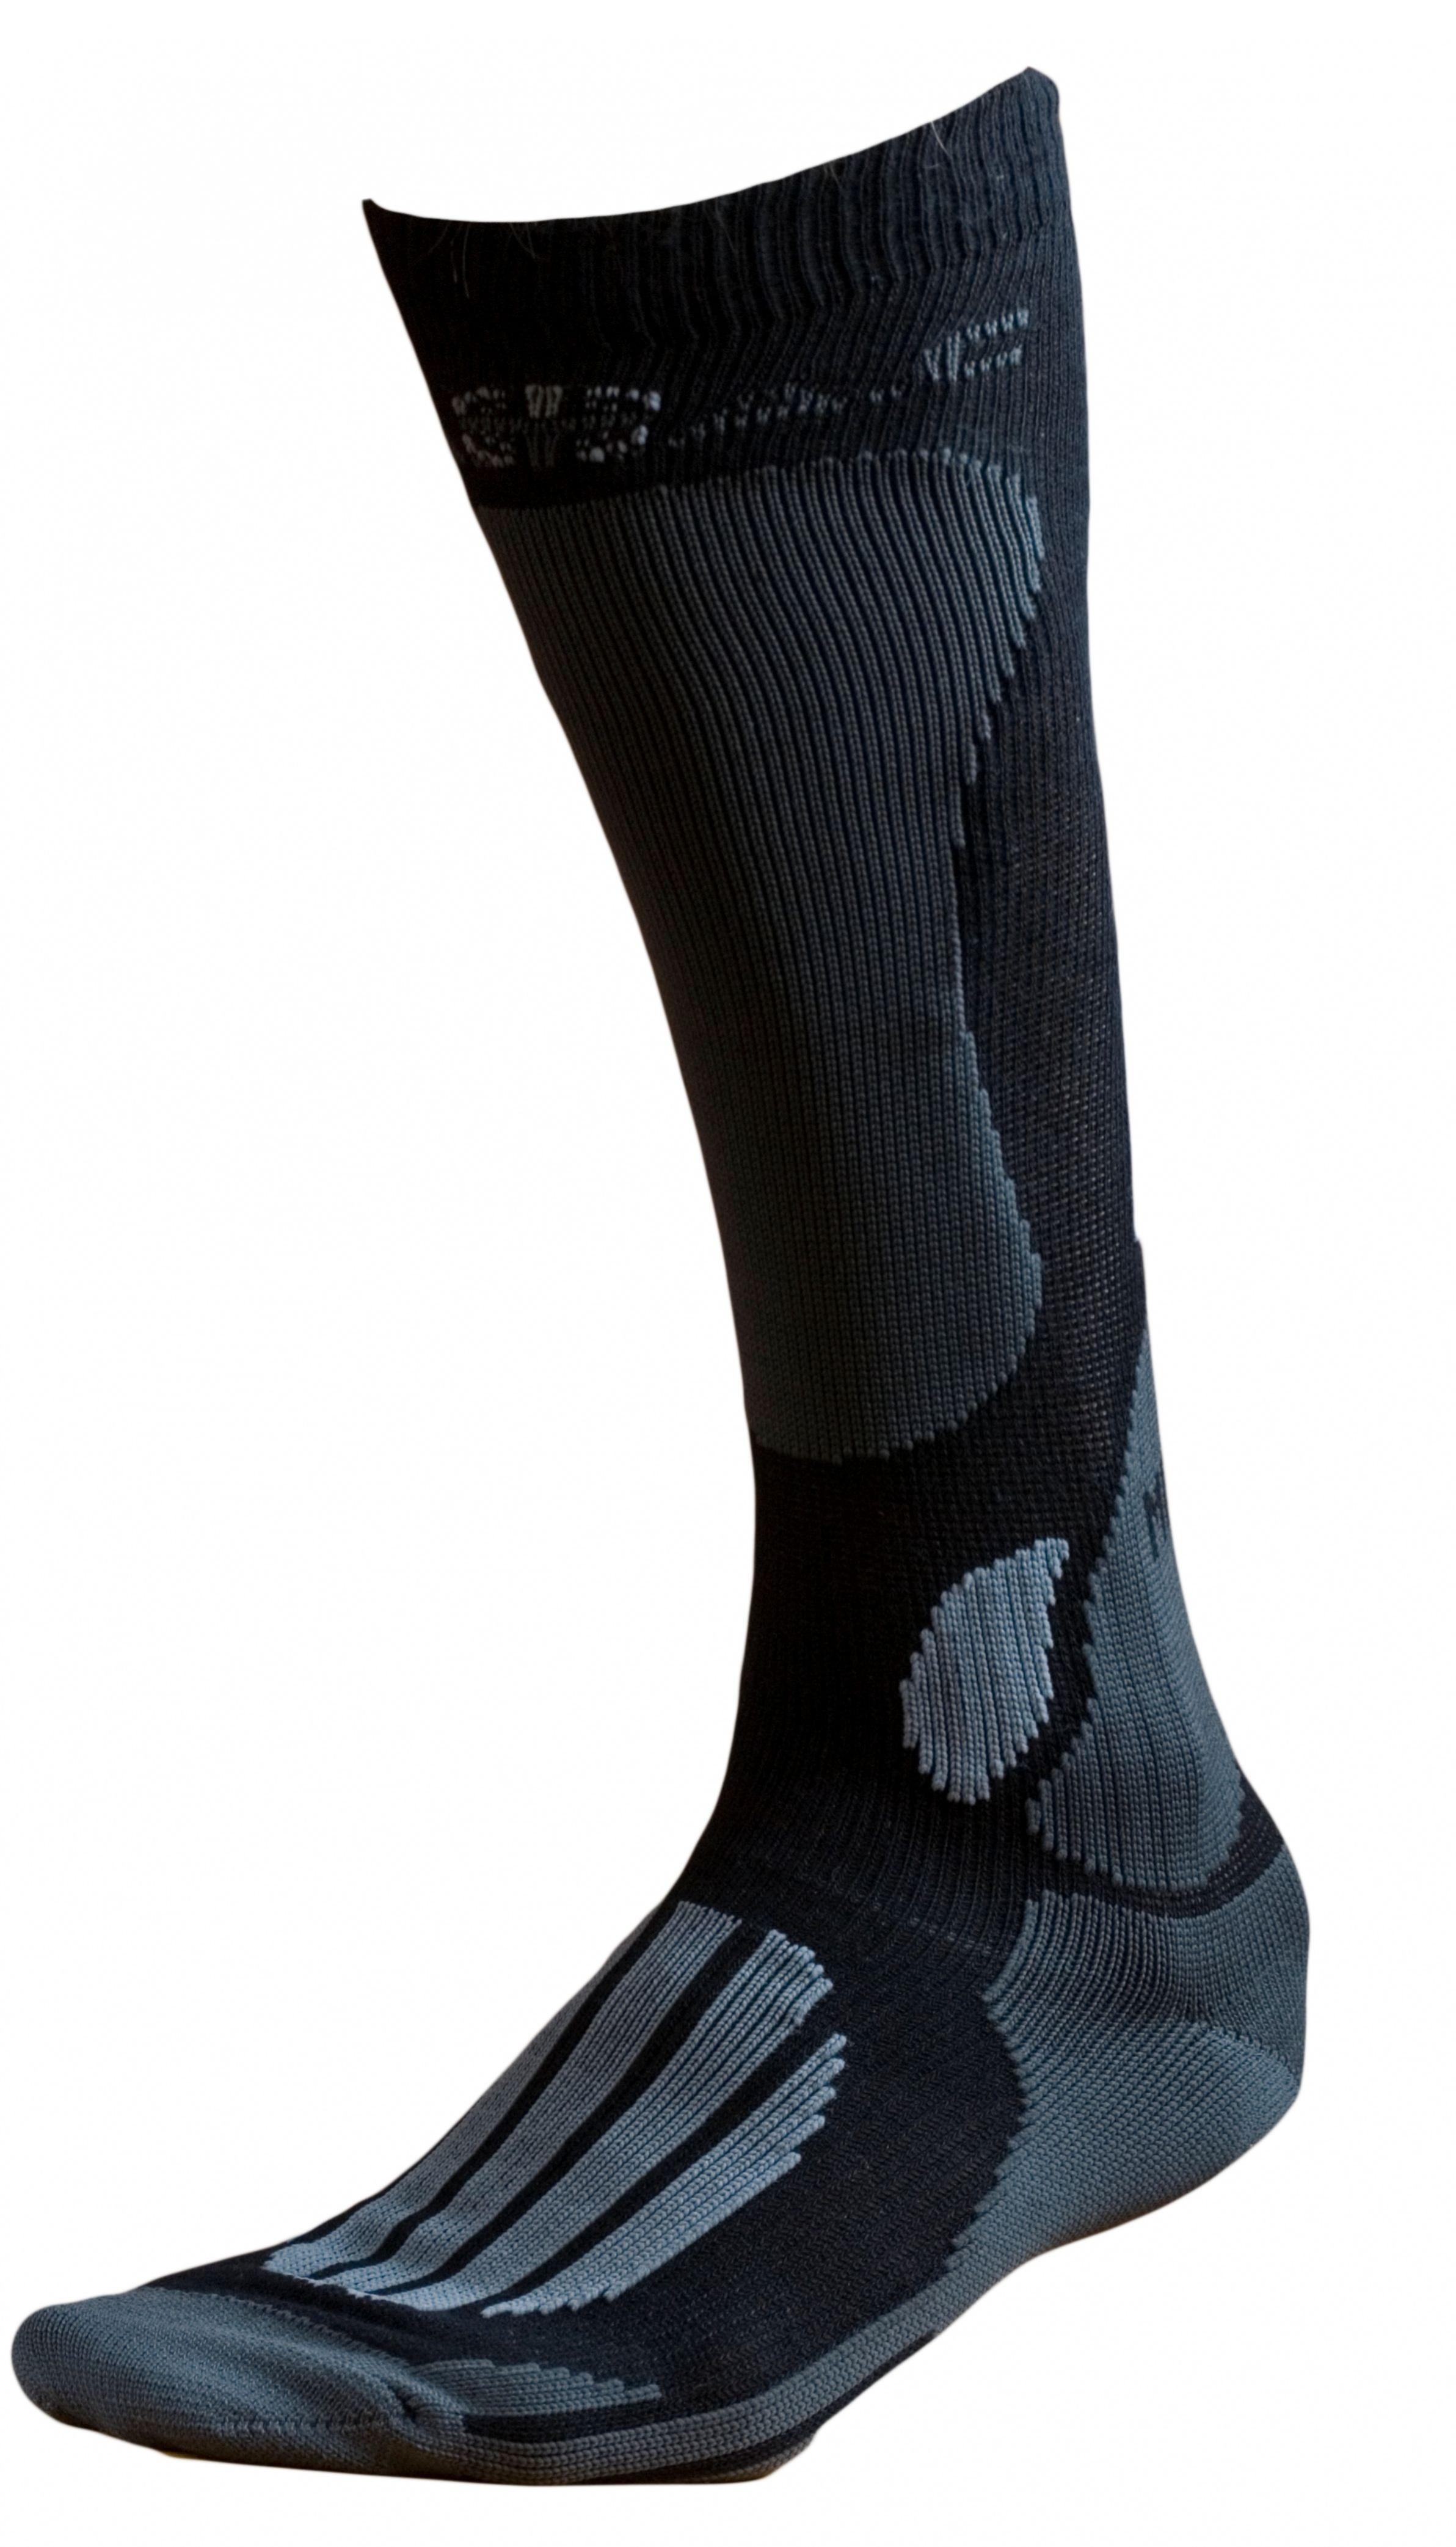 Ponožky BATAC Mission MI01 vel. 34-35 - black/grey